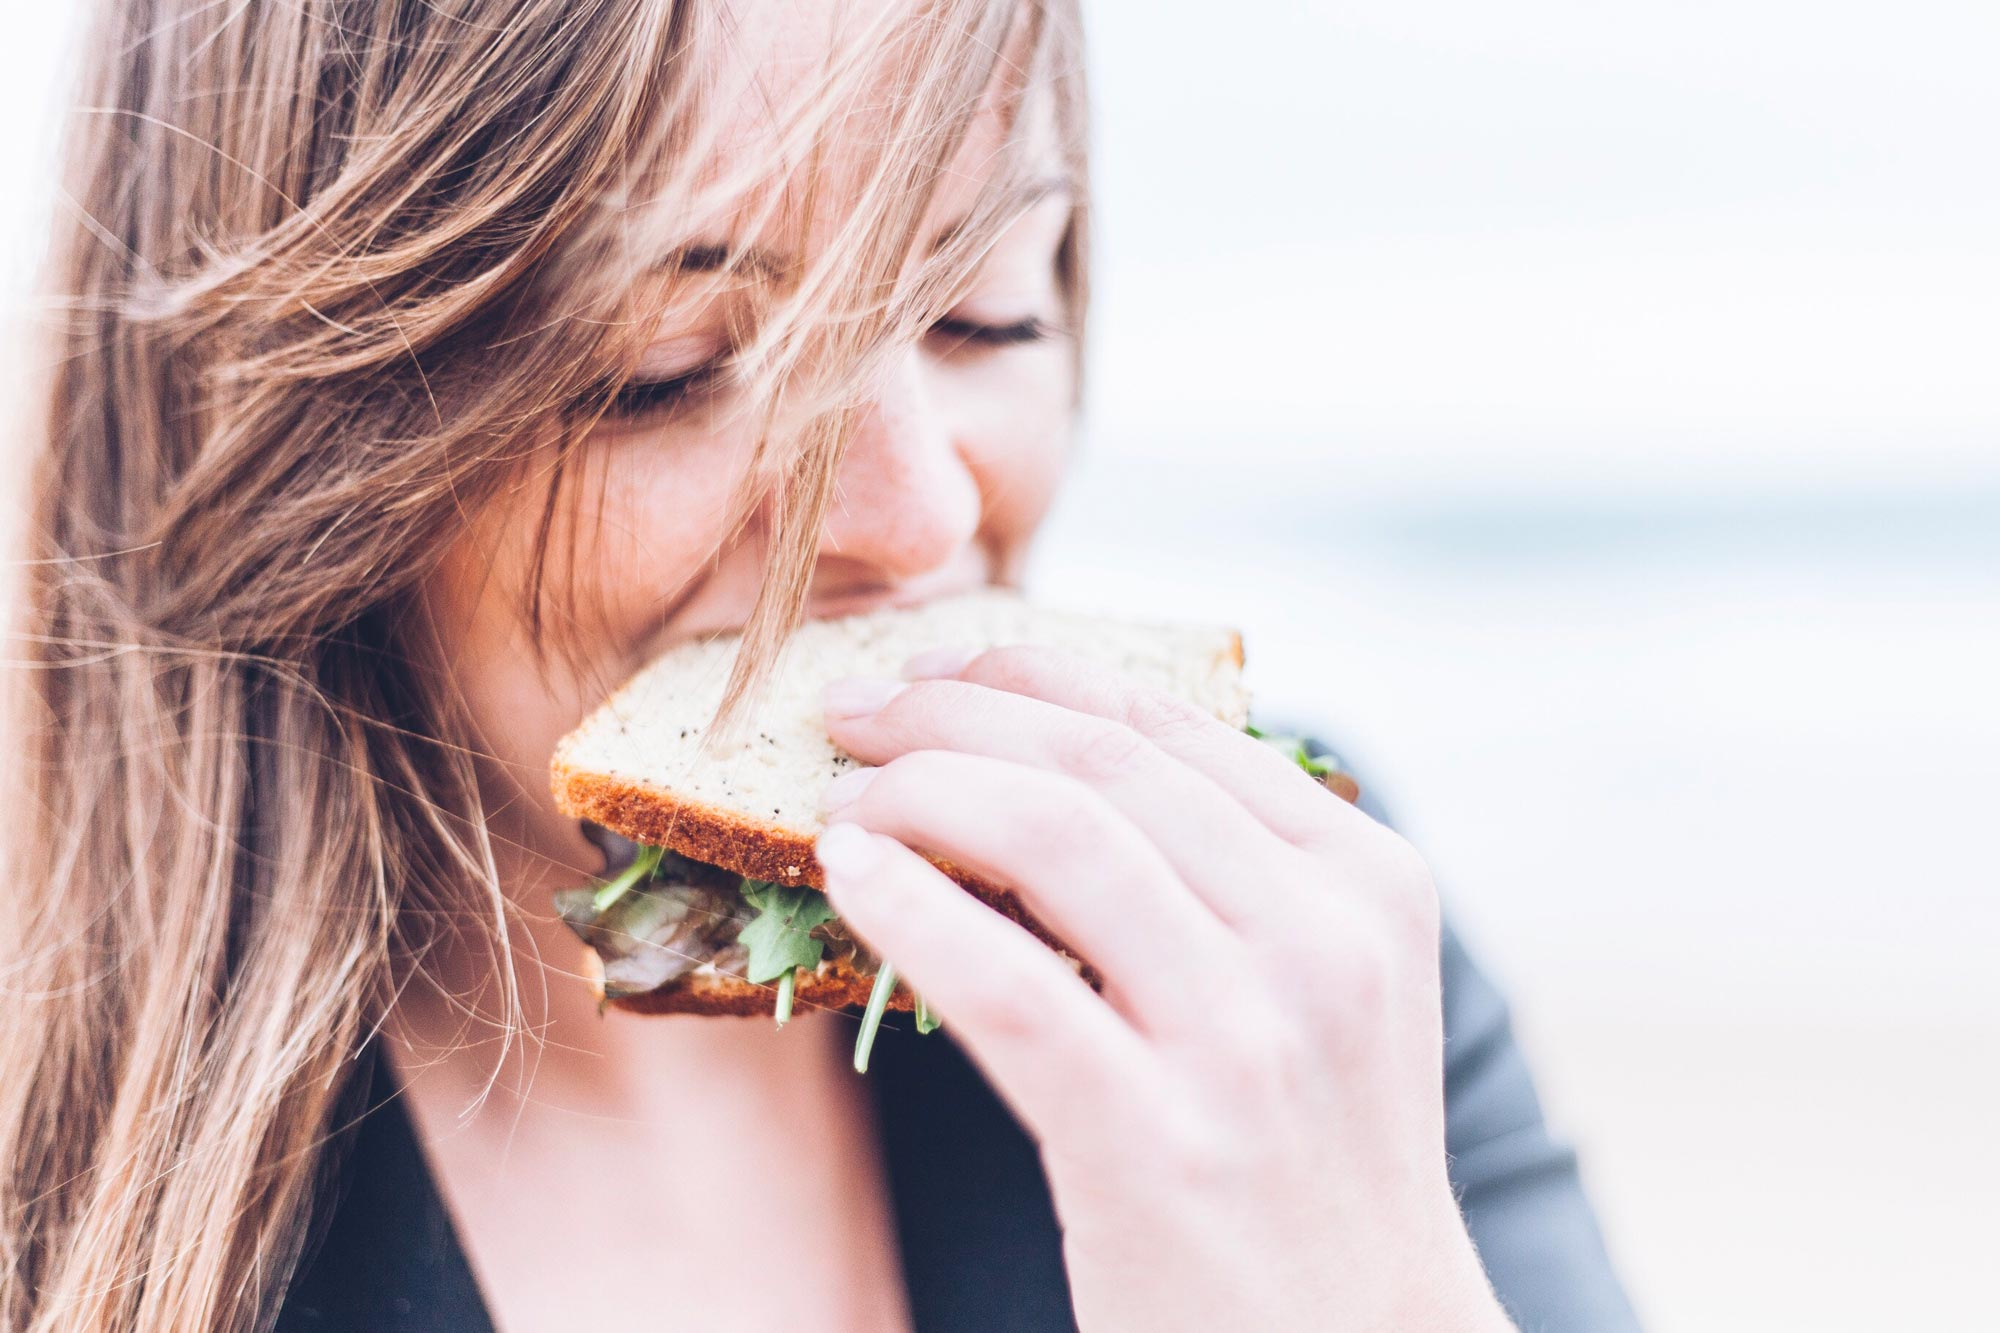 Femme mangeant un sandwich